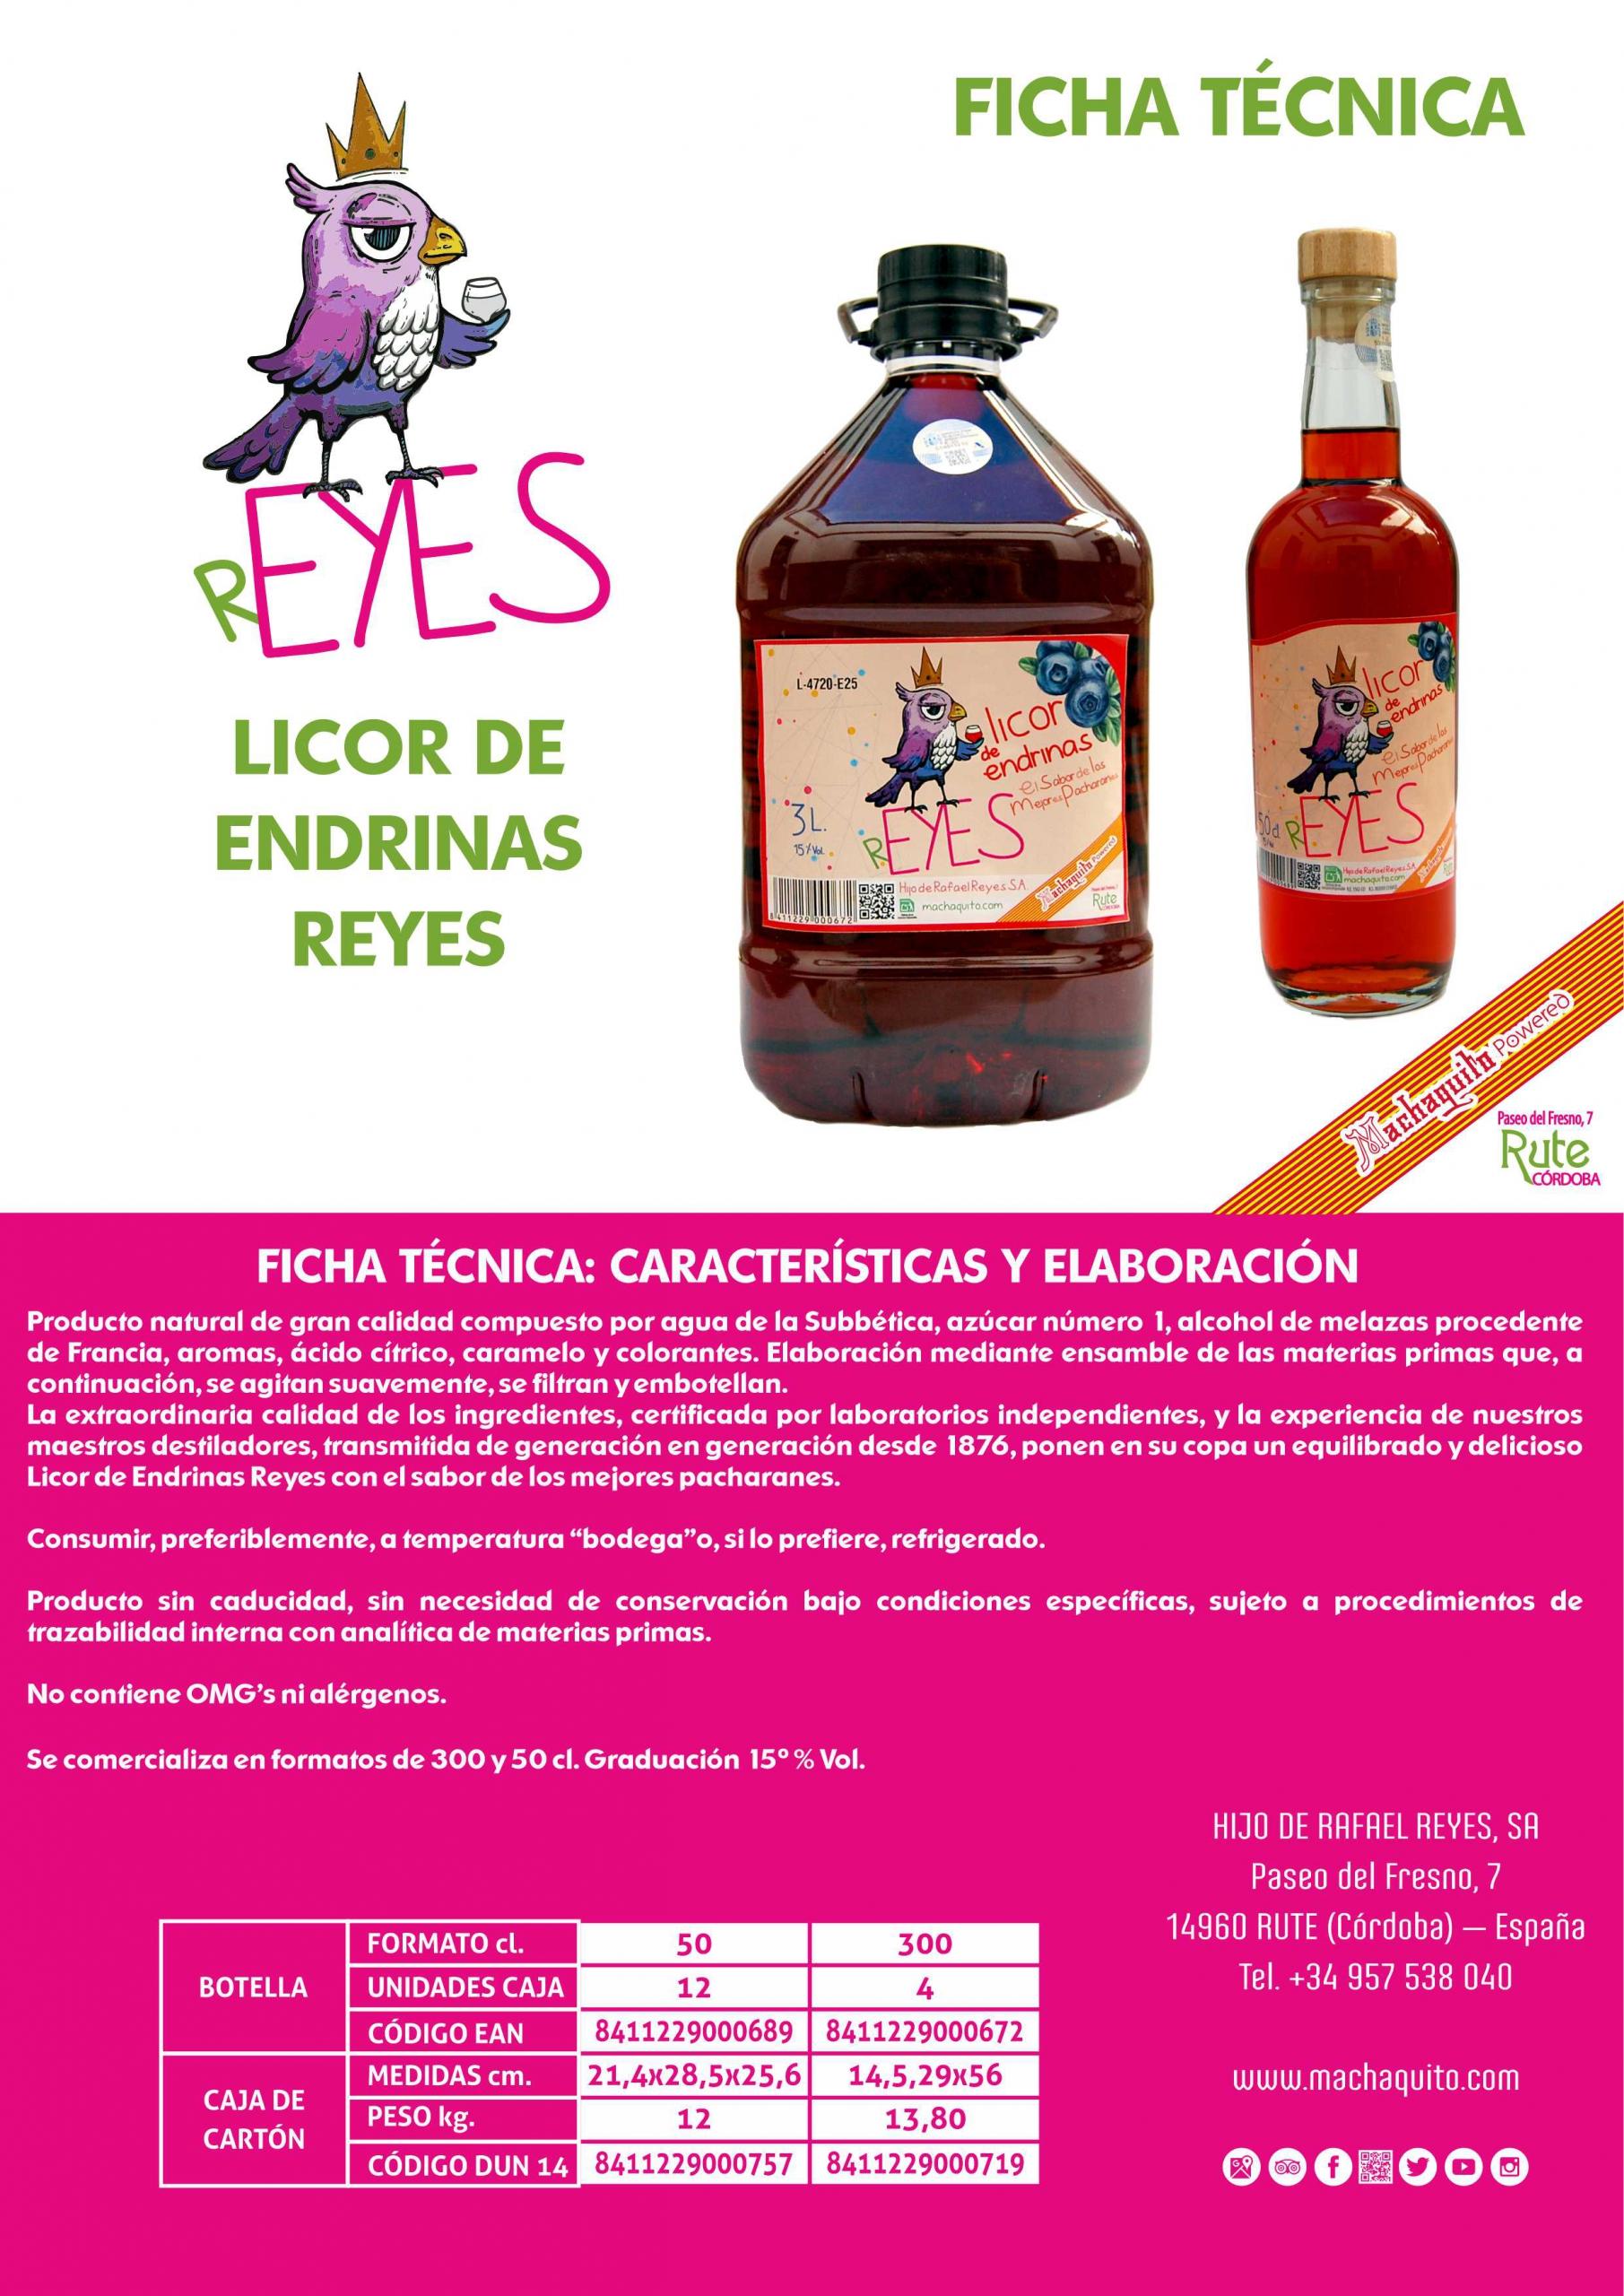 LICOR DE ENDRINAS FICHA